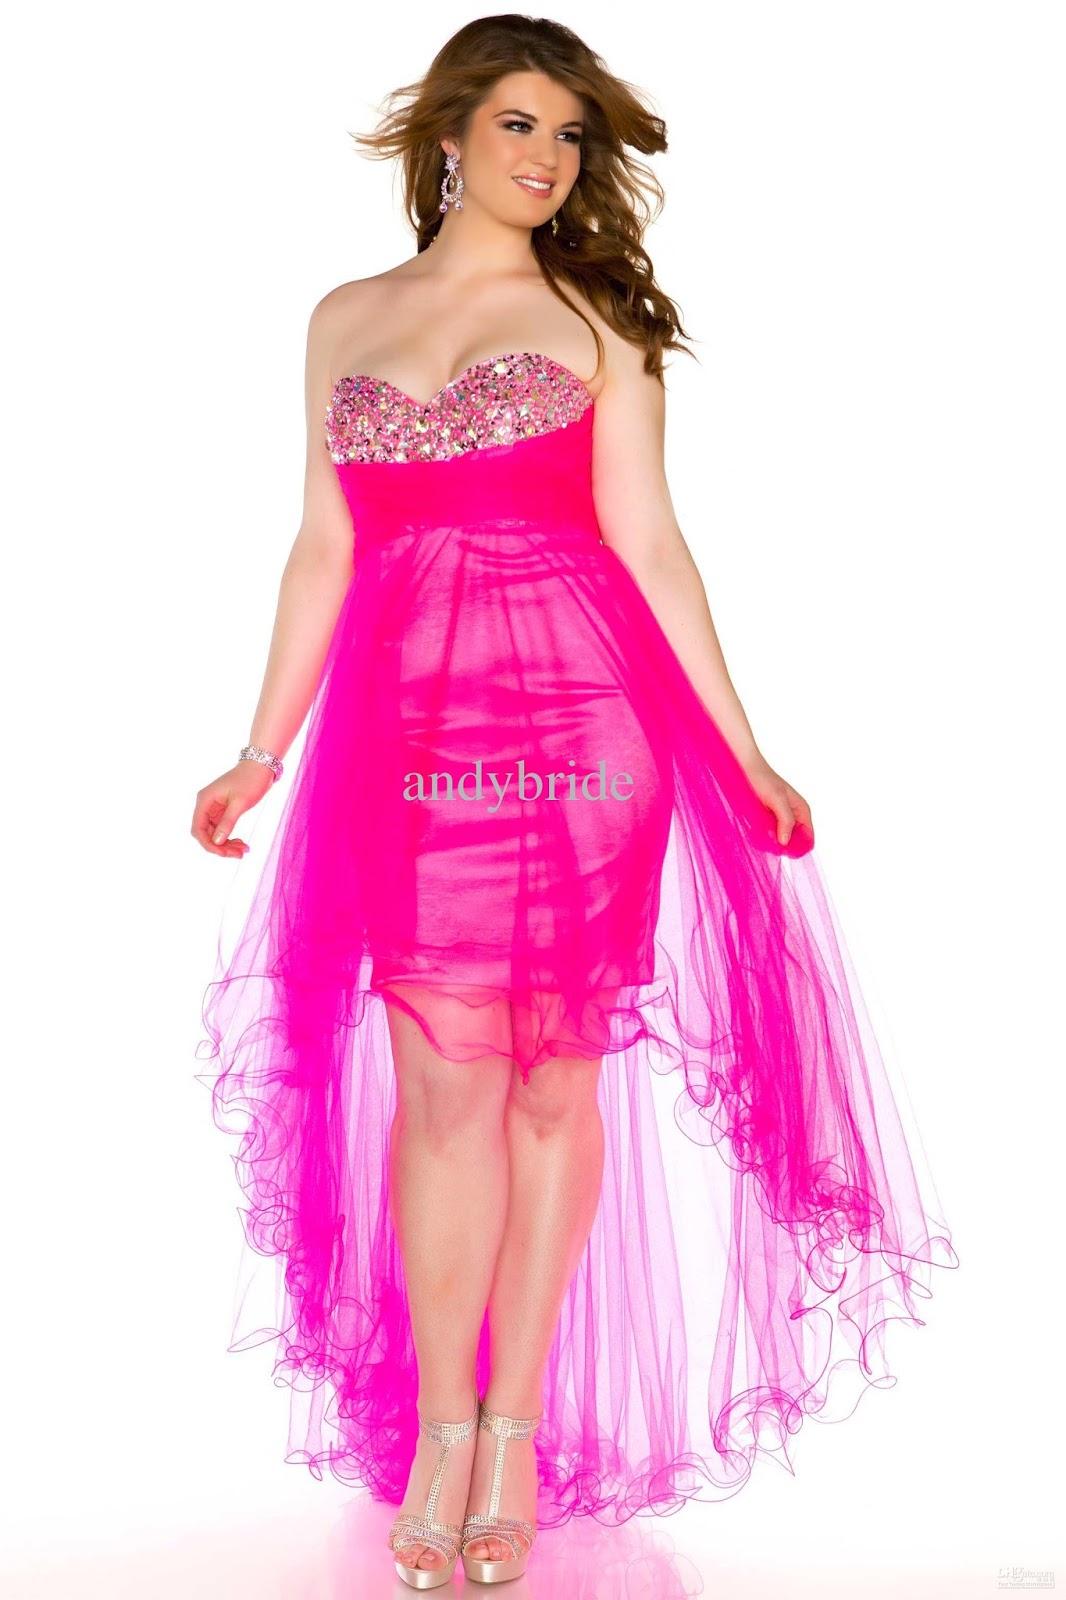 Dress like celebrity for cheap